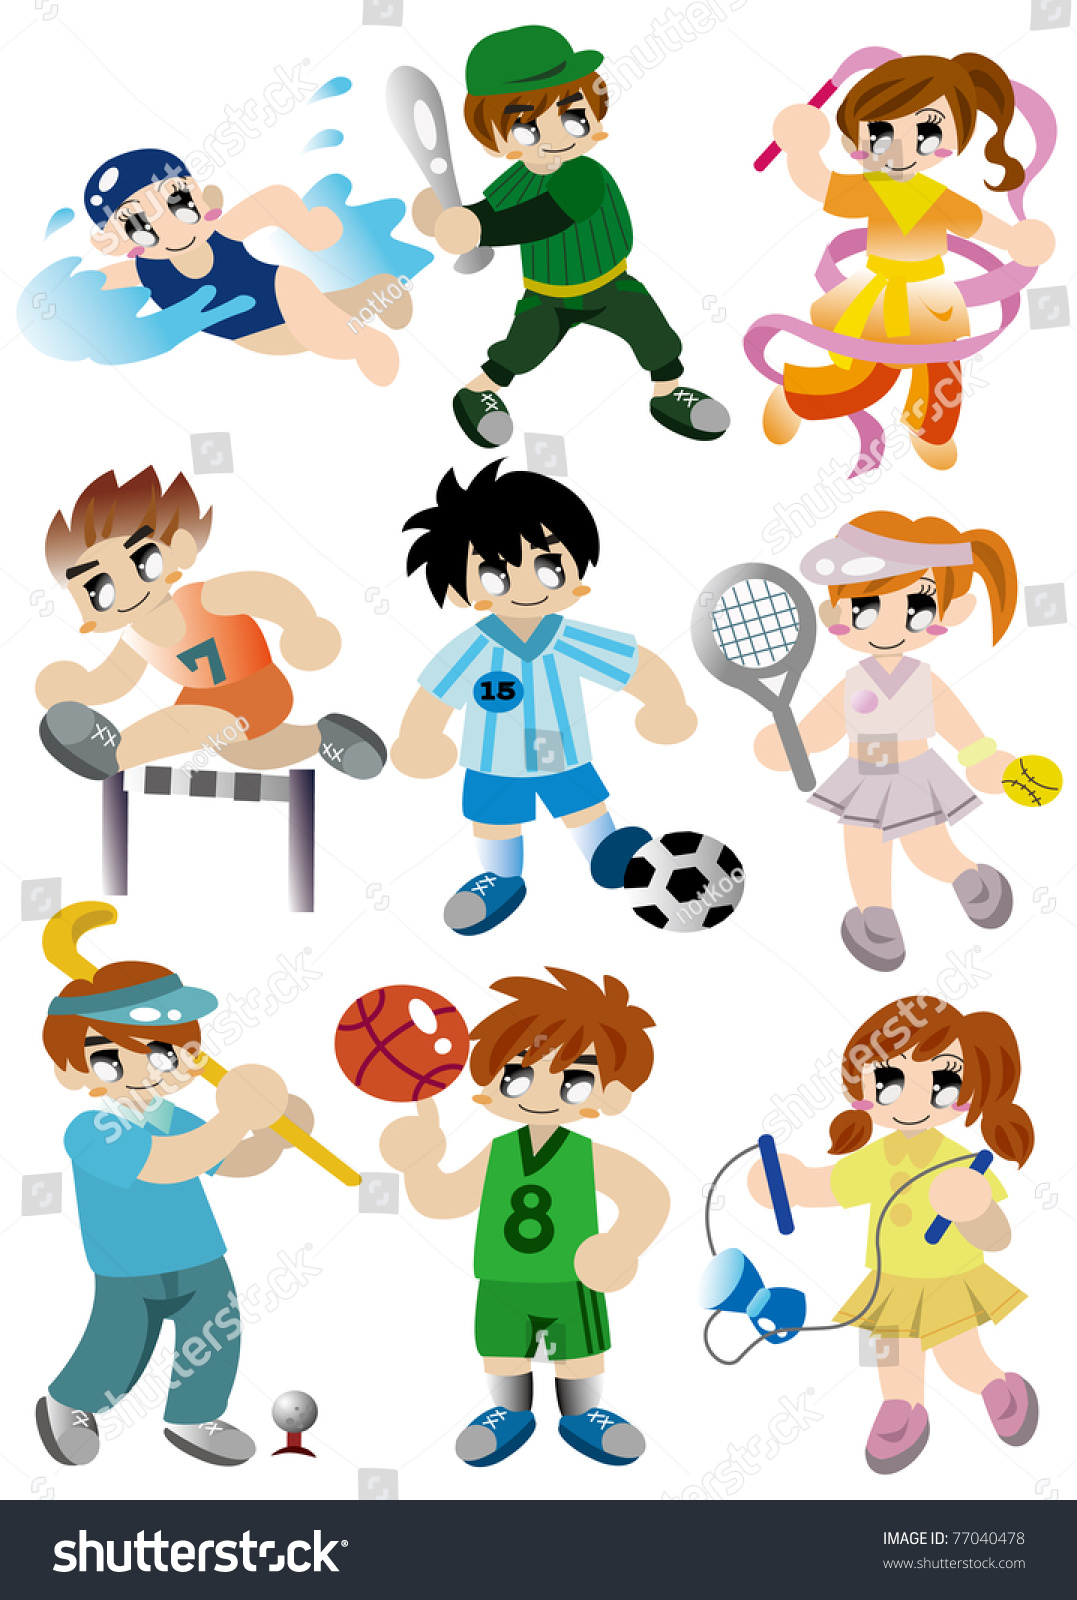 cartoon sport player icon shutterstock vector